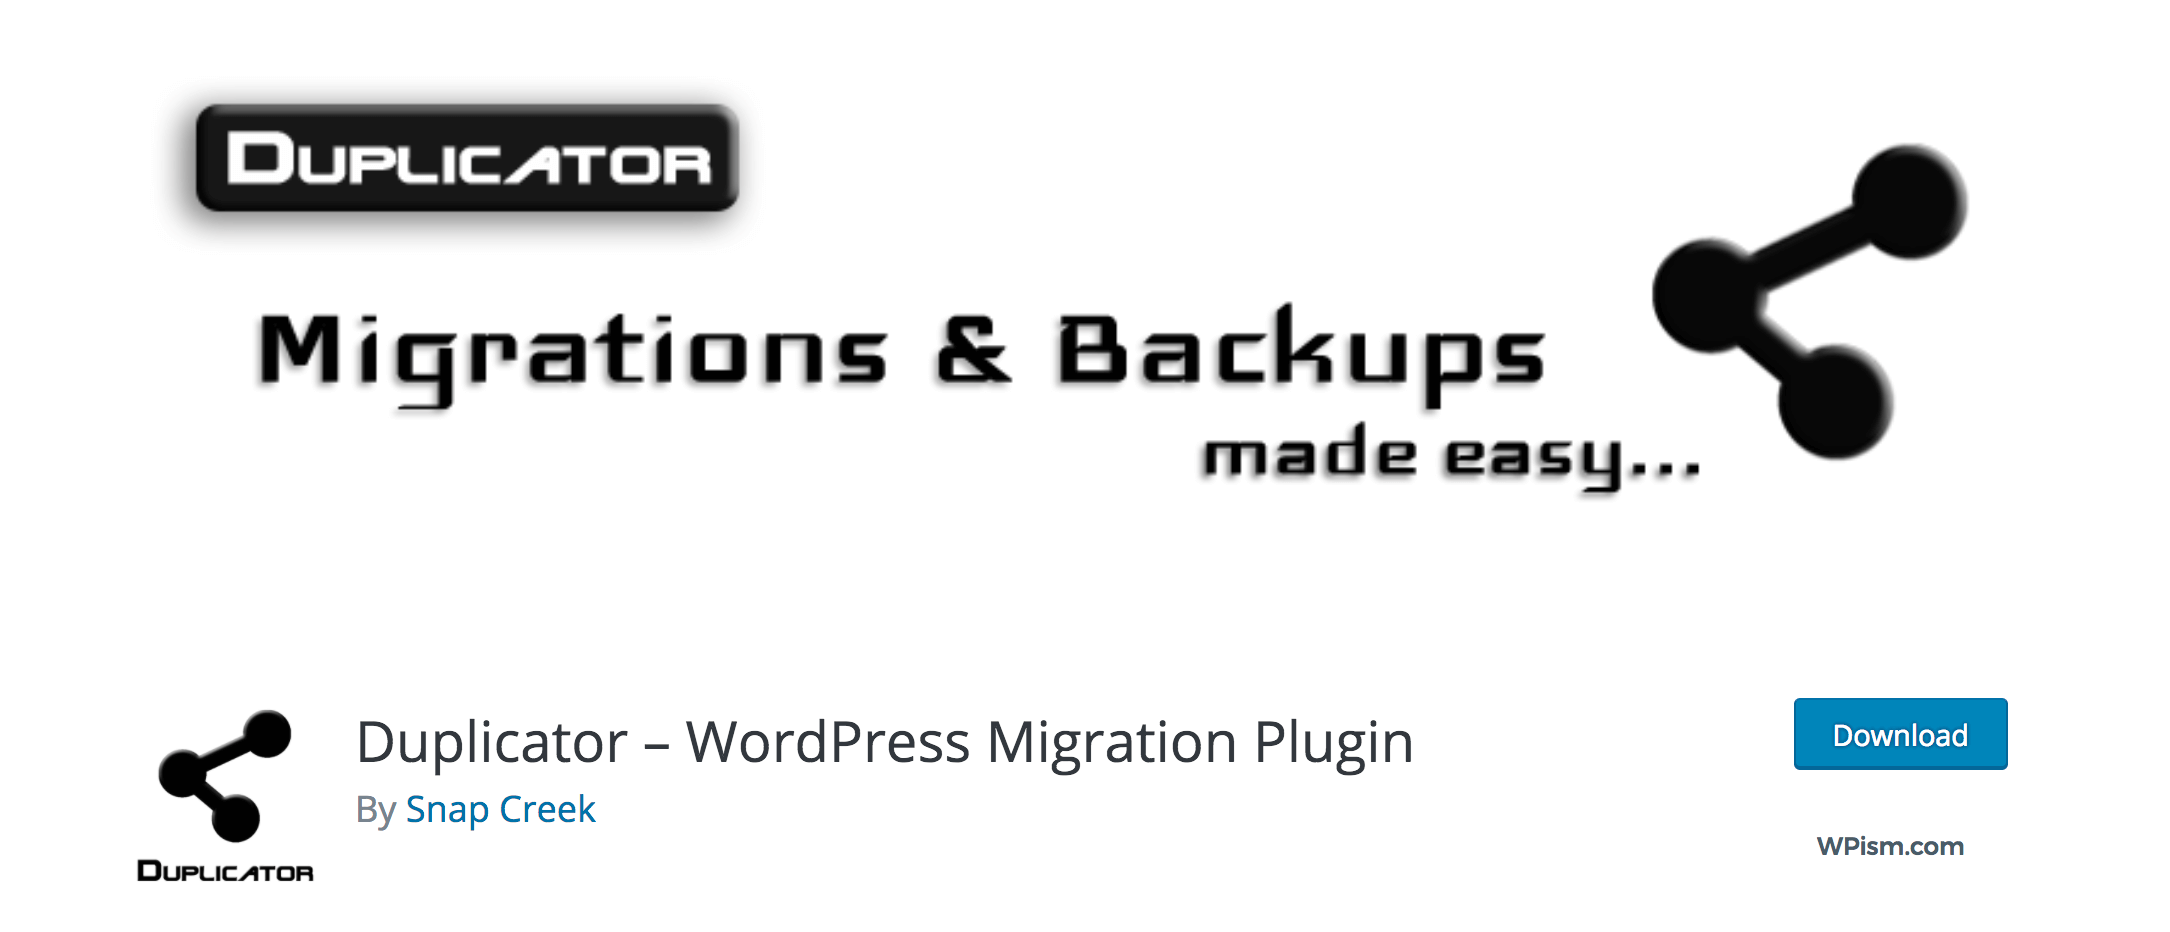 Duplicator WordPress Plugin Migration Plugin